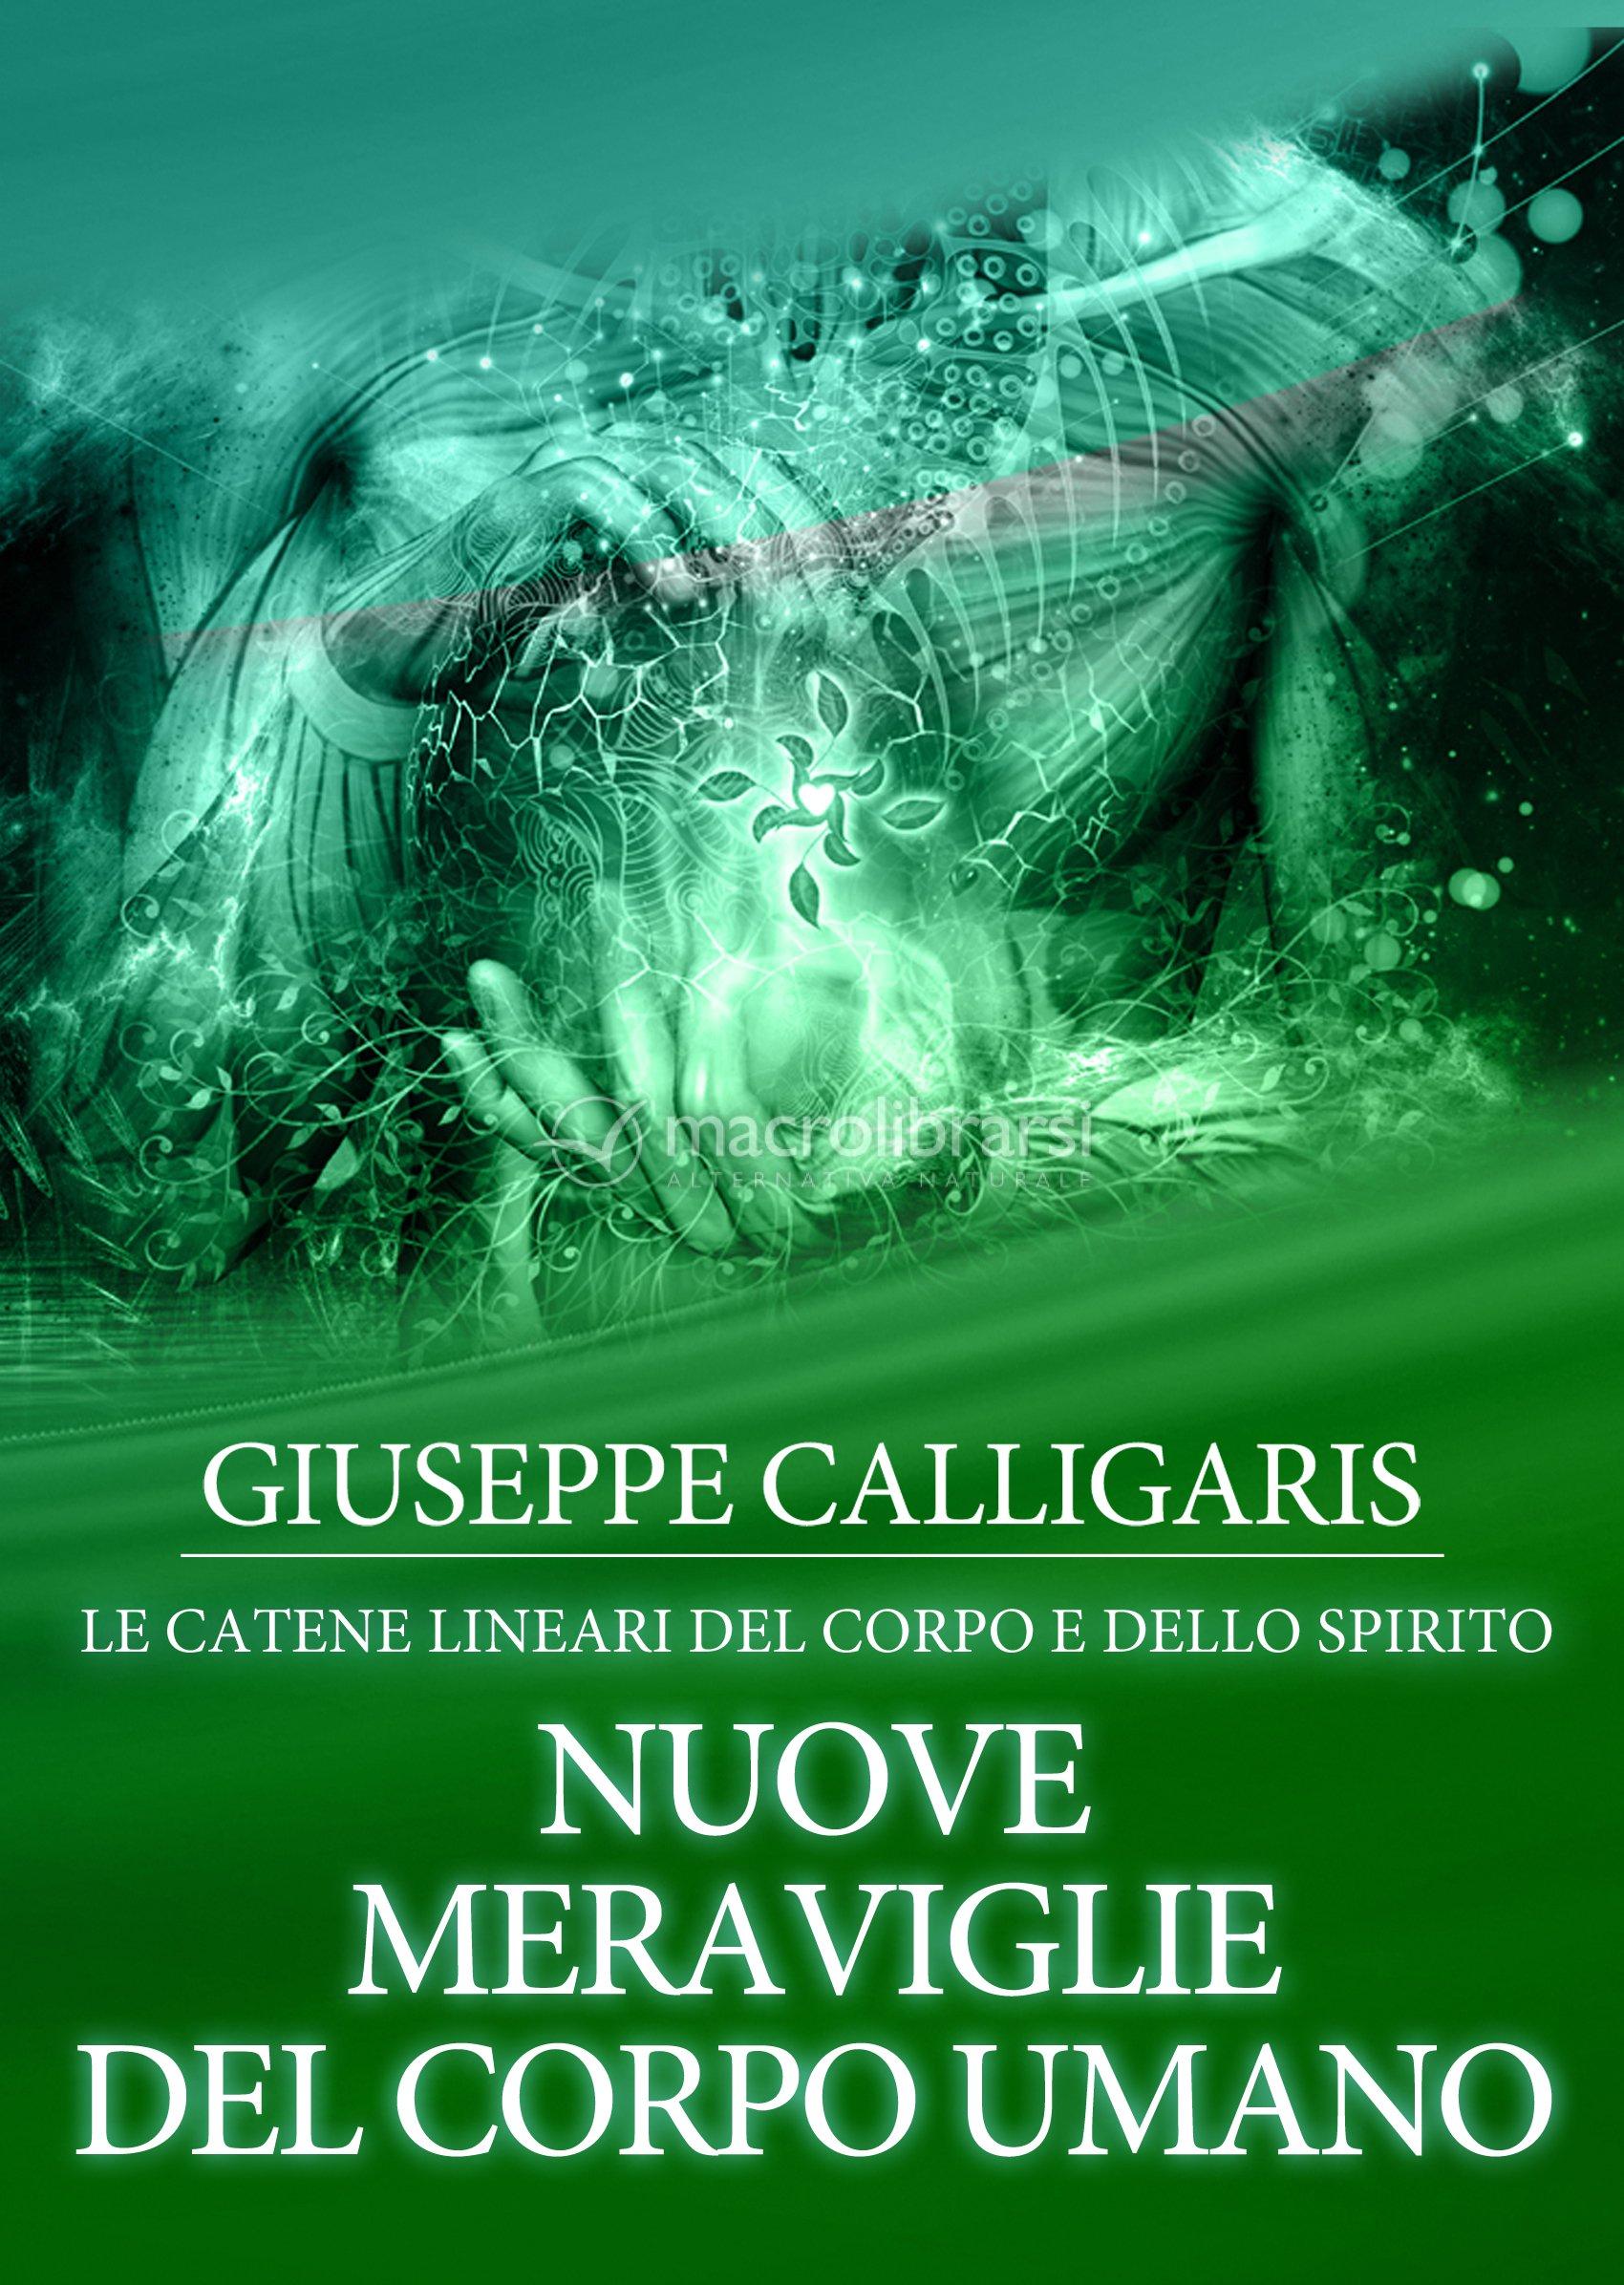 Ebook nuove meraviglie del corpo umano giuseppe calligaris for Calligaris giuseppe